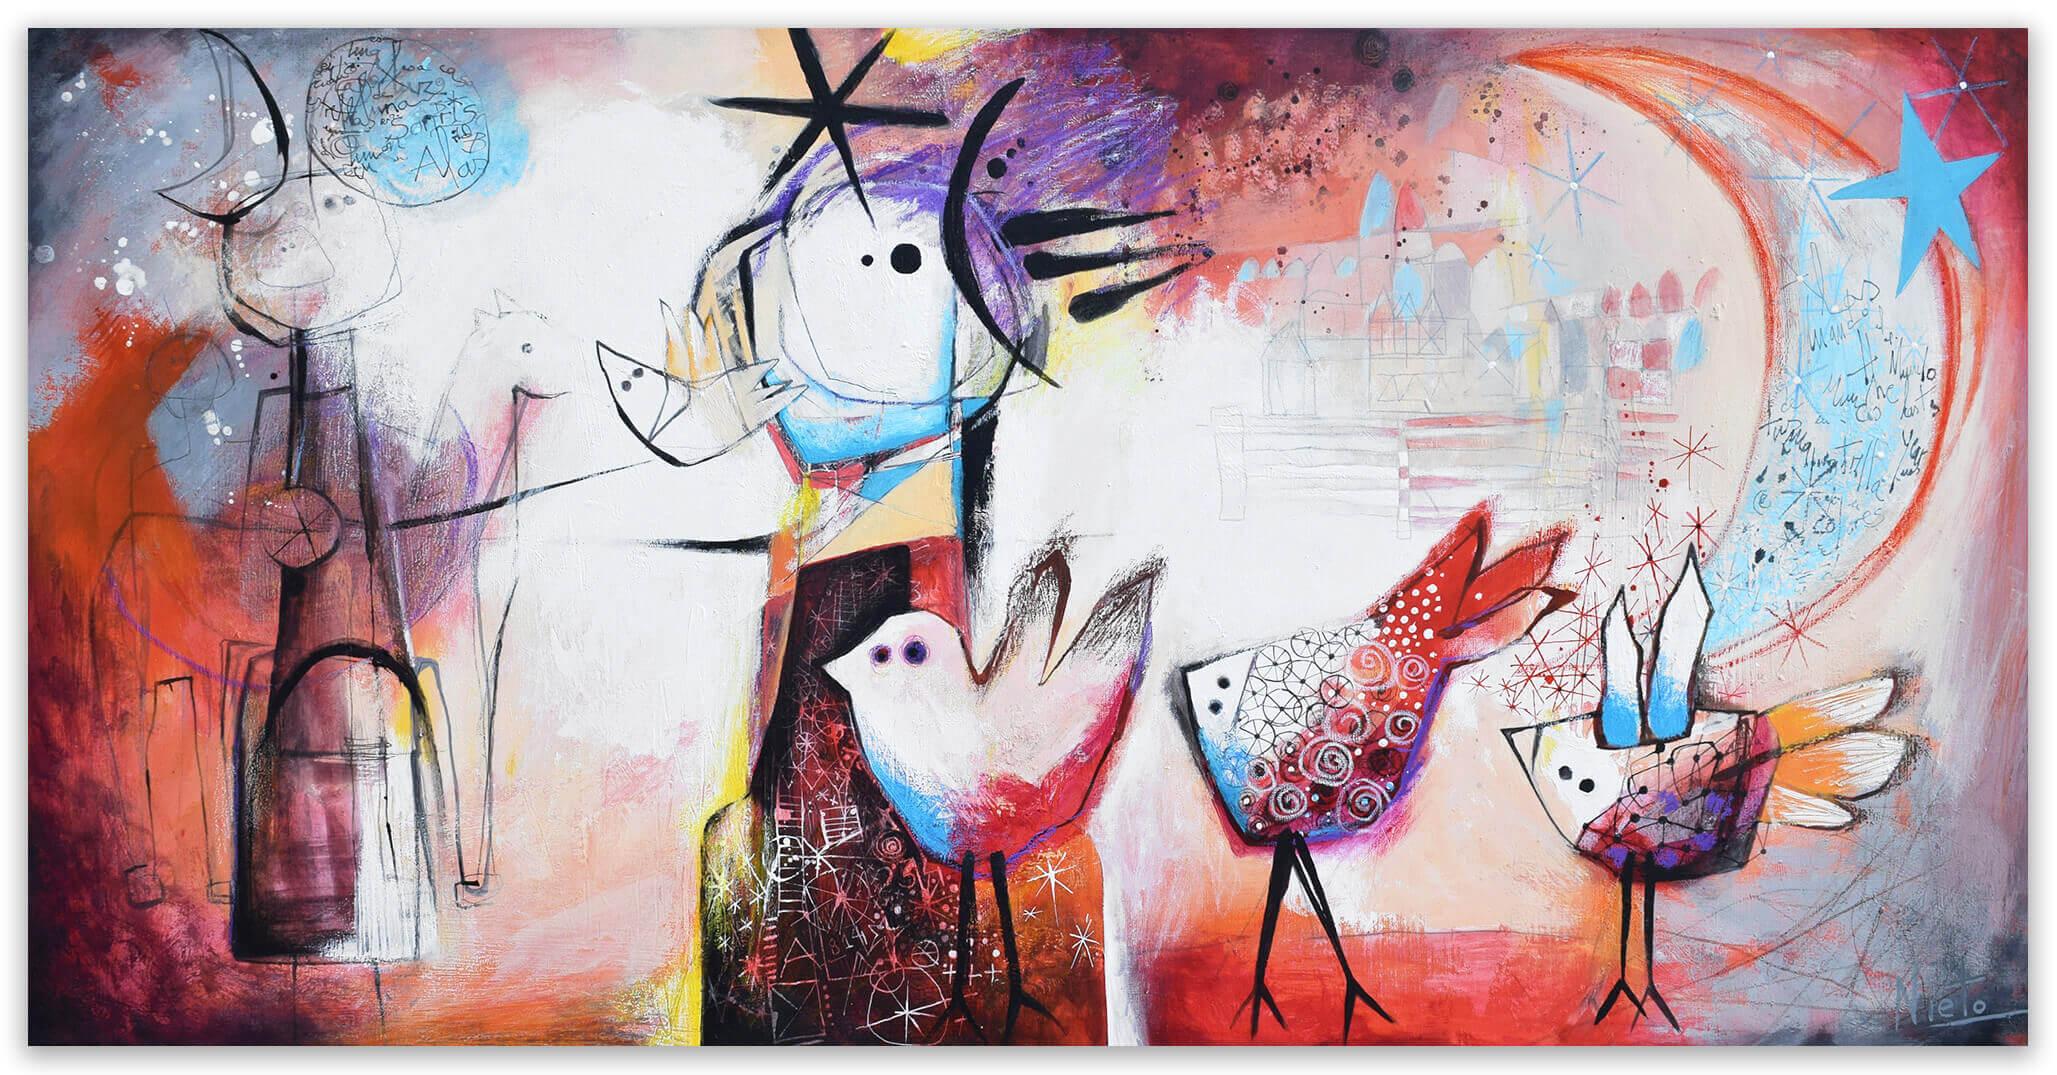 Baile de primavera - Original pairing on canvas by Angeles Nieto